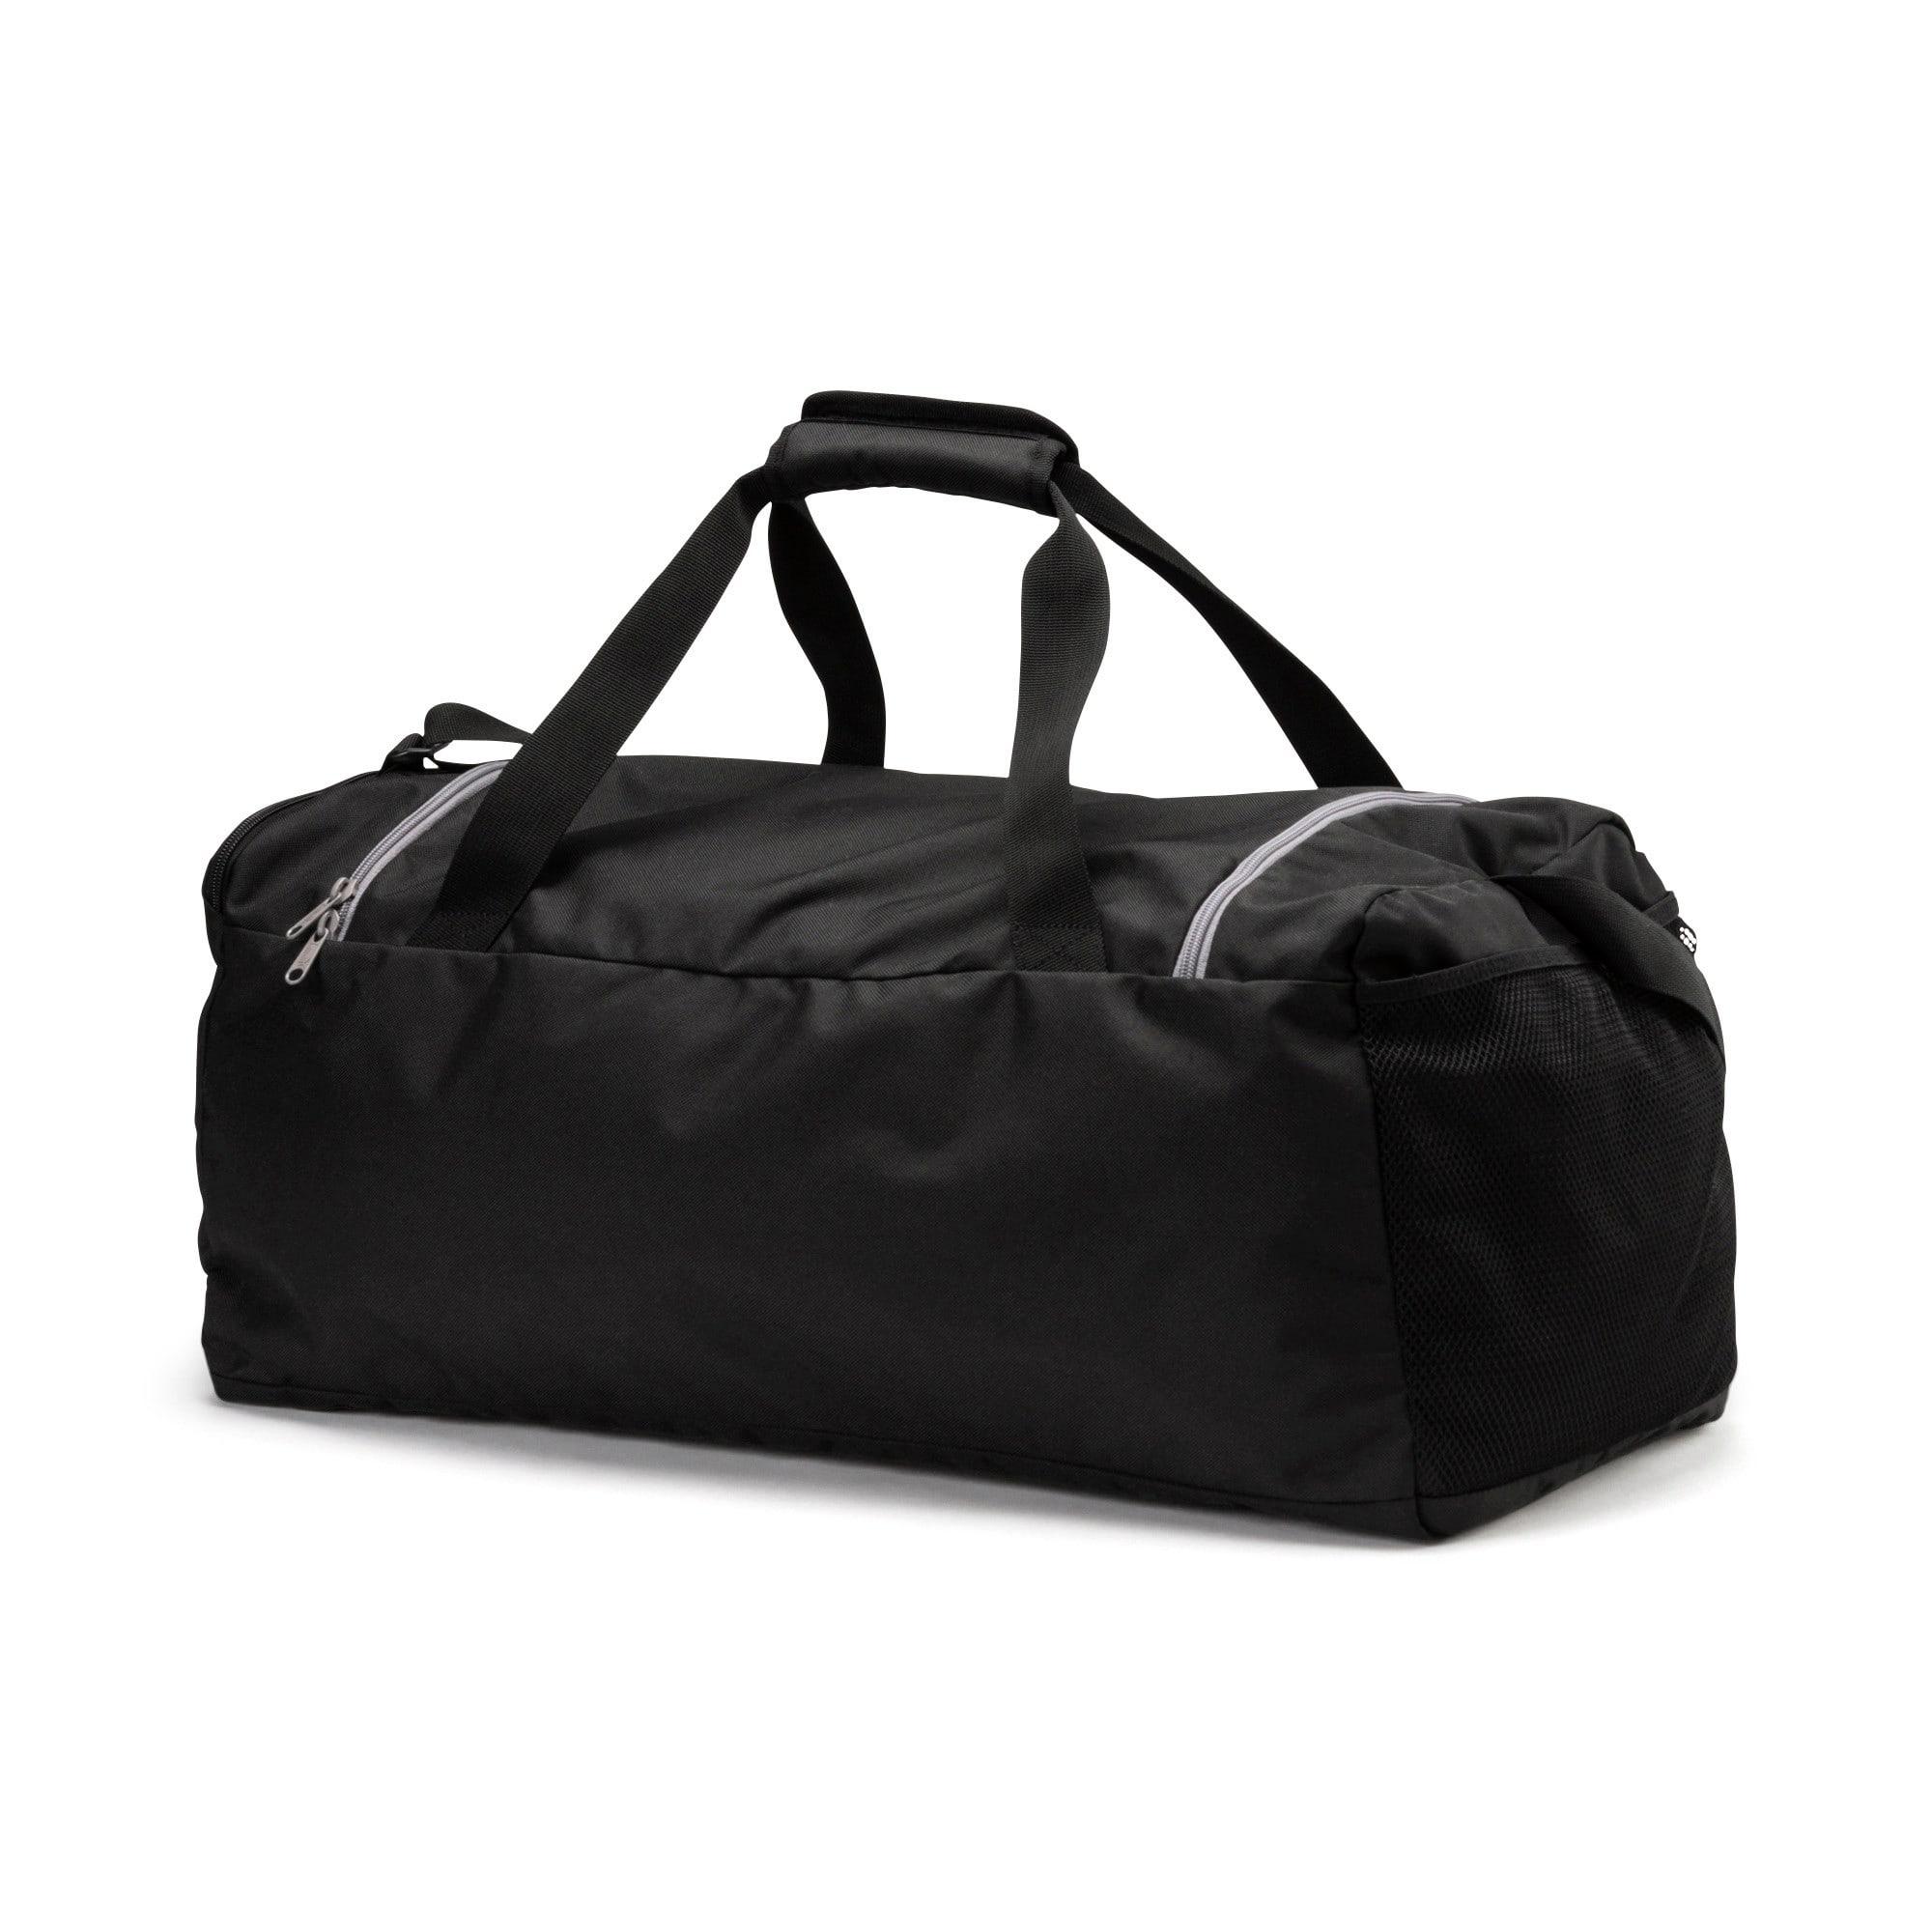 Thumbnail 2 of Fundamentals Medium Sports Bag, Puma Black, medium